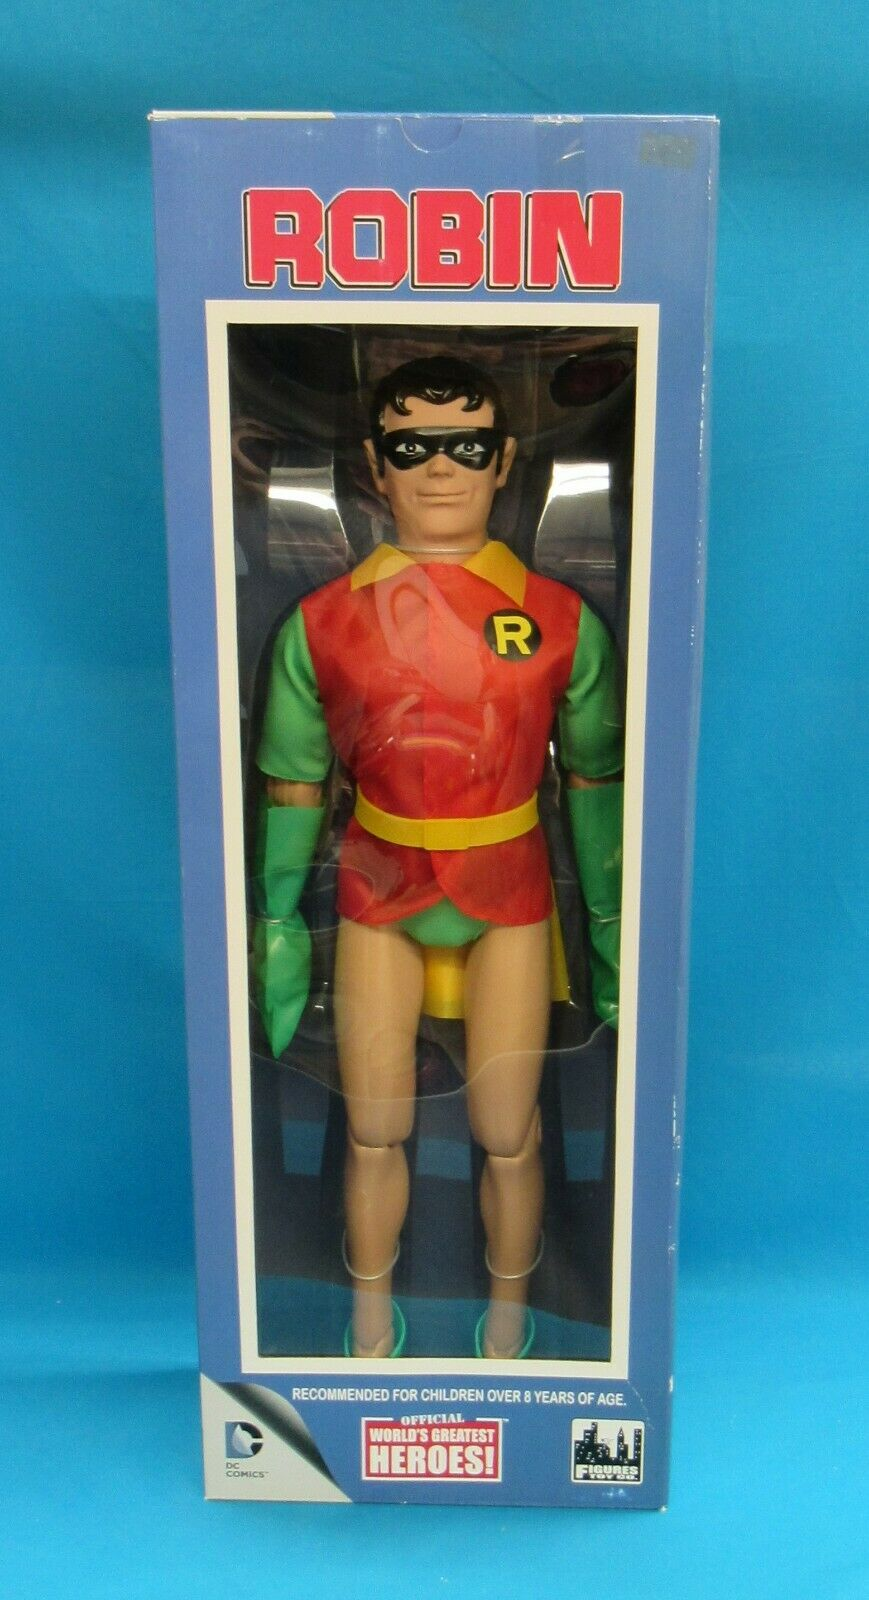 Figuras Juguete Co DC Comics oficial más grandes del mundo héroes  Robin 18 en la figura